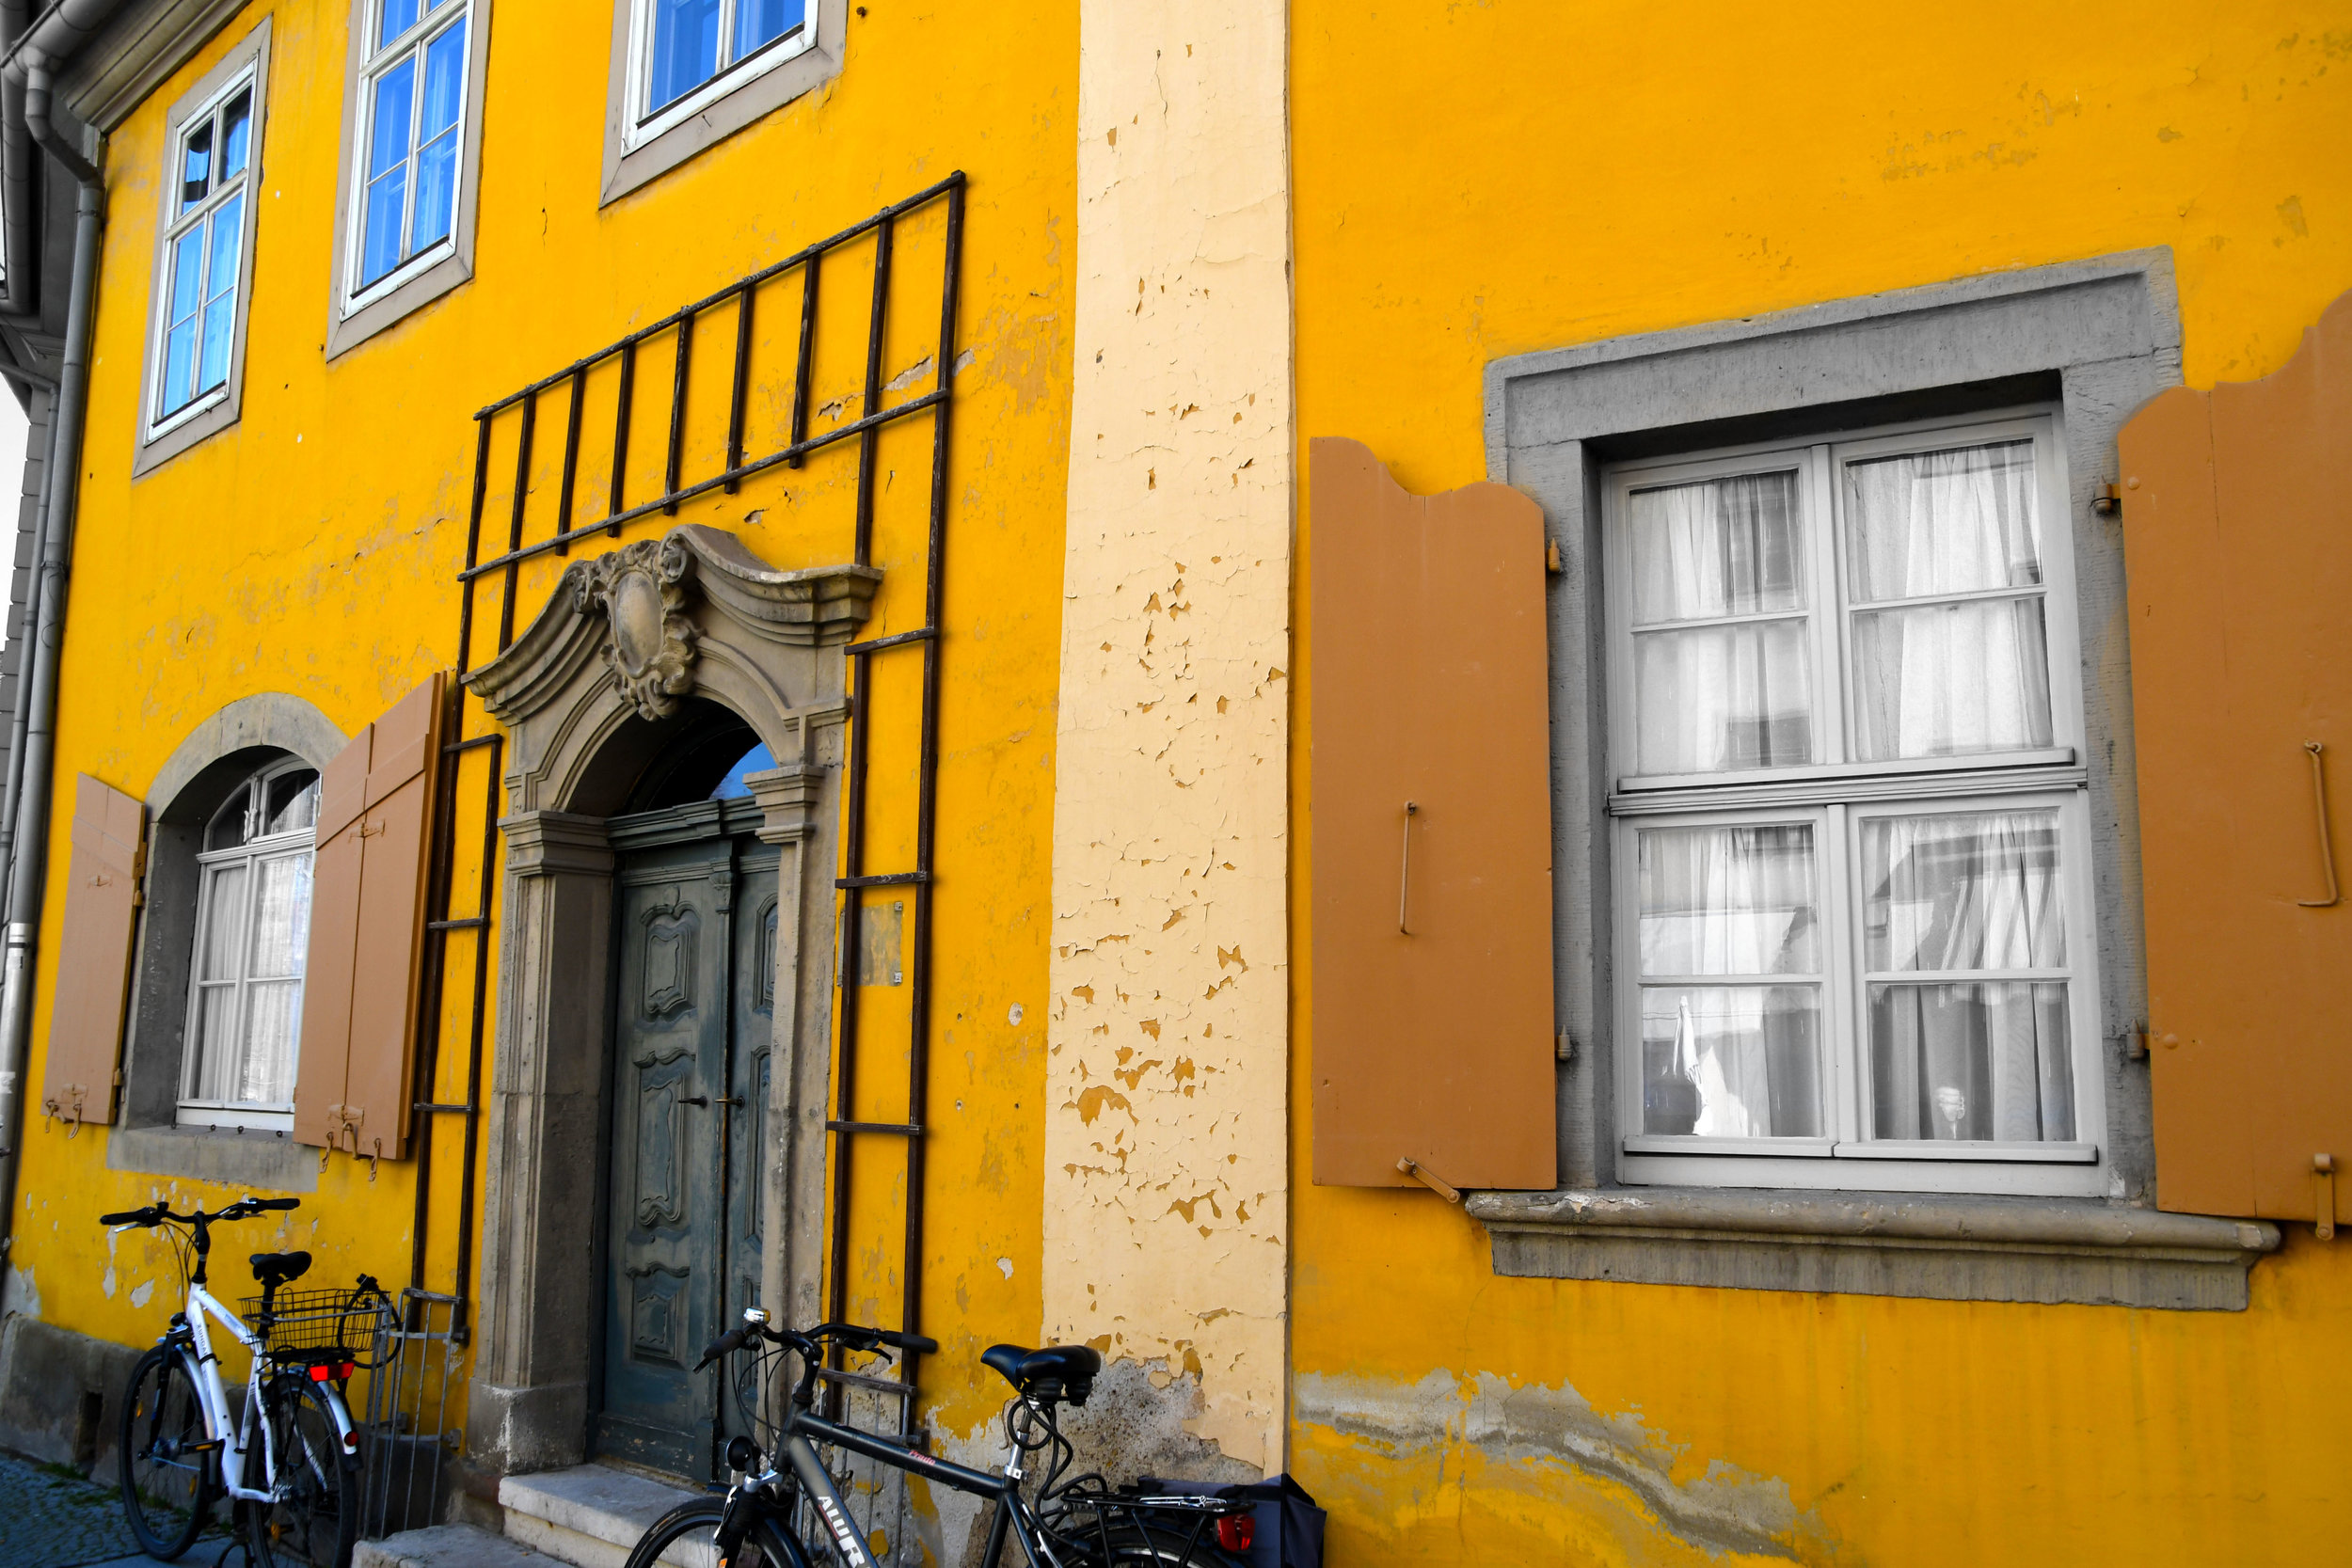 YellowBuilding.jpg